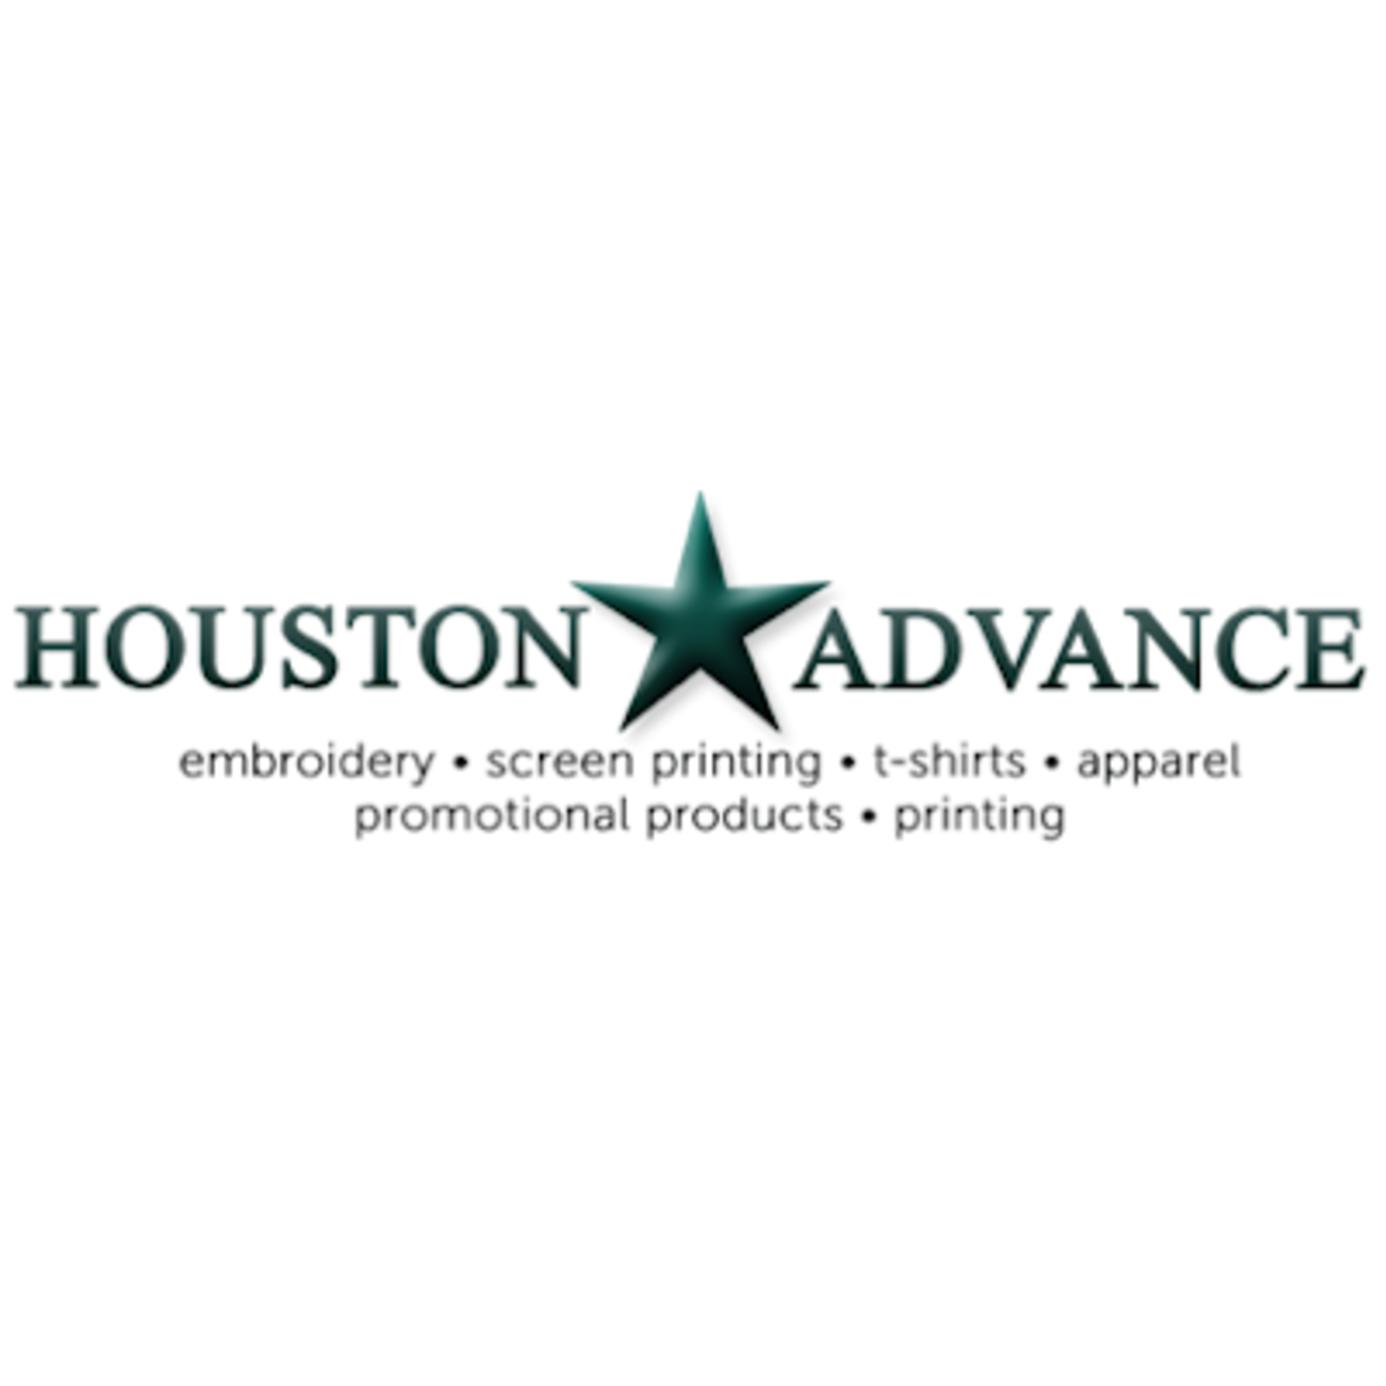 Houston Advance - Houston, TX - Advertising Agencies & Public Relations